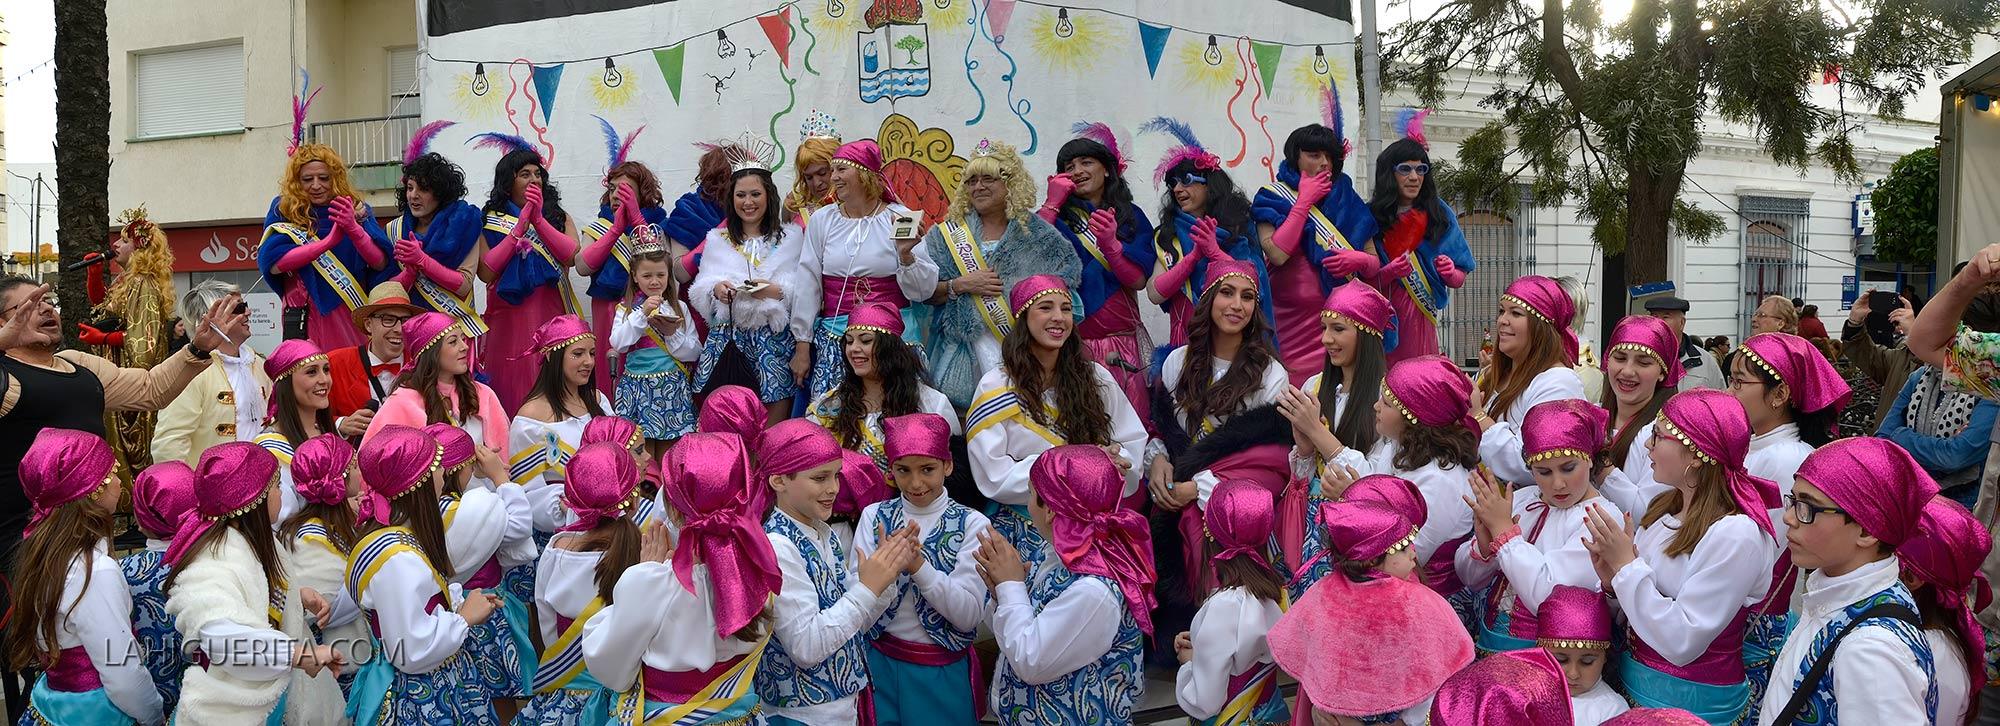 Disfraces callejeros del Carnaval de Isla Cristina 2015